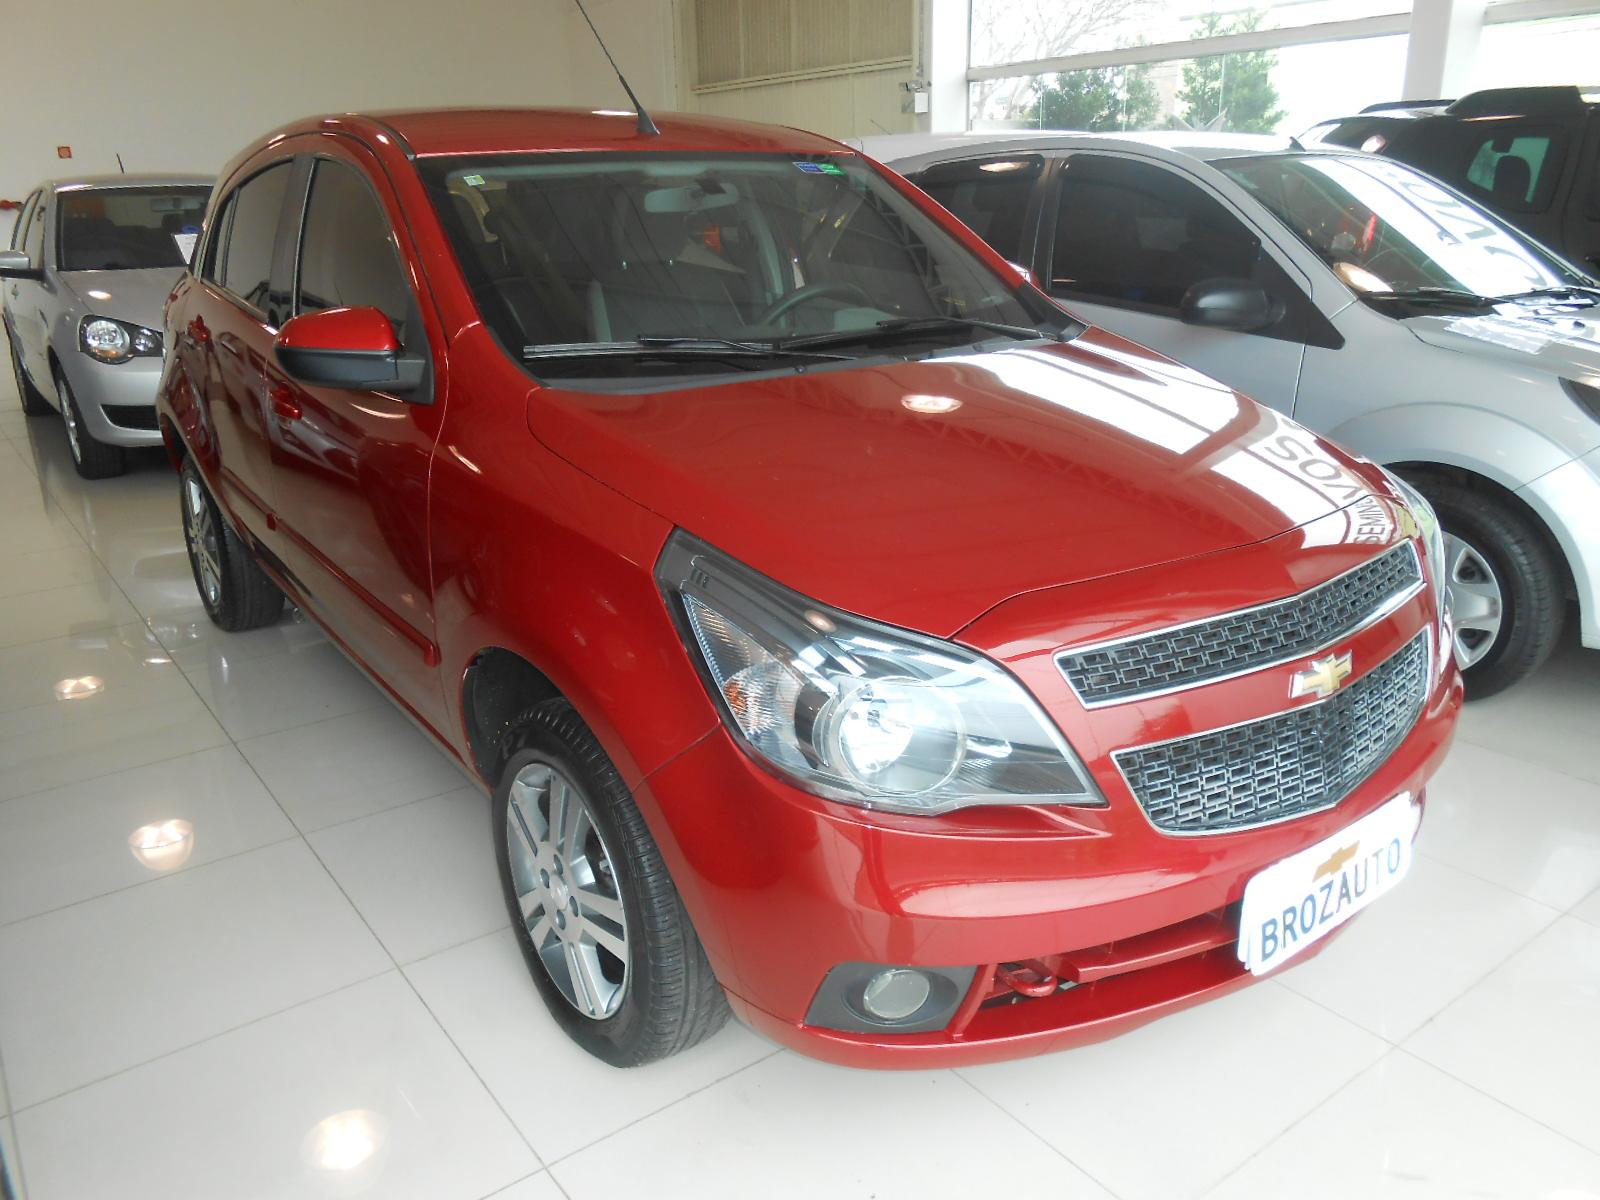 2013 GM AGILE LTZ 1.4L